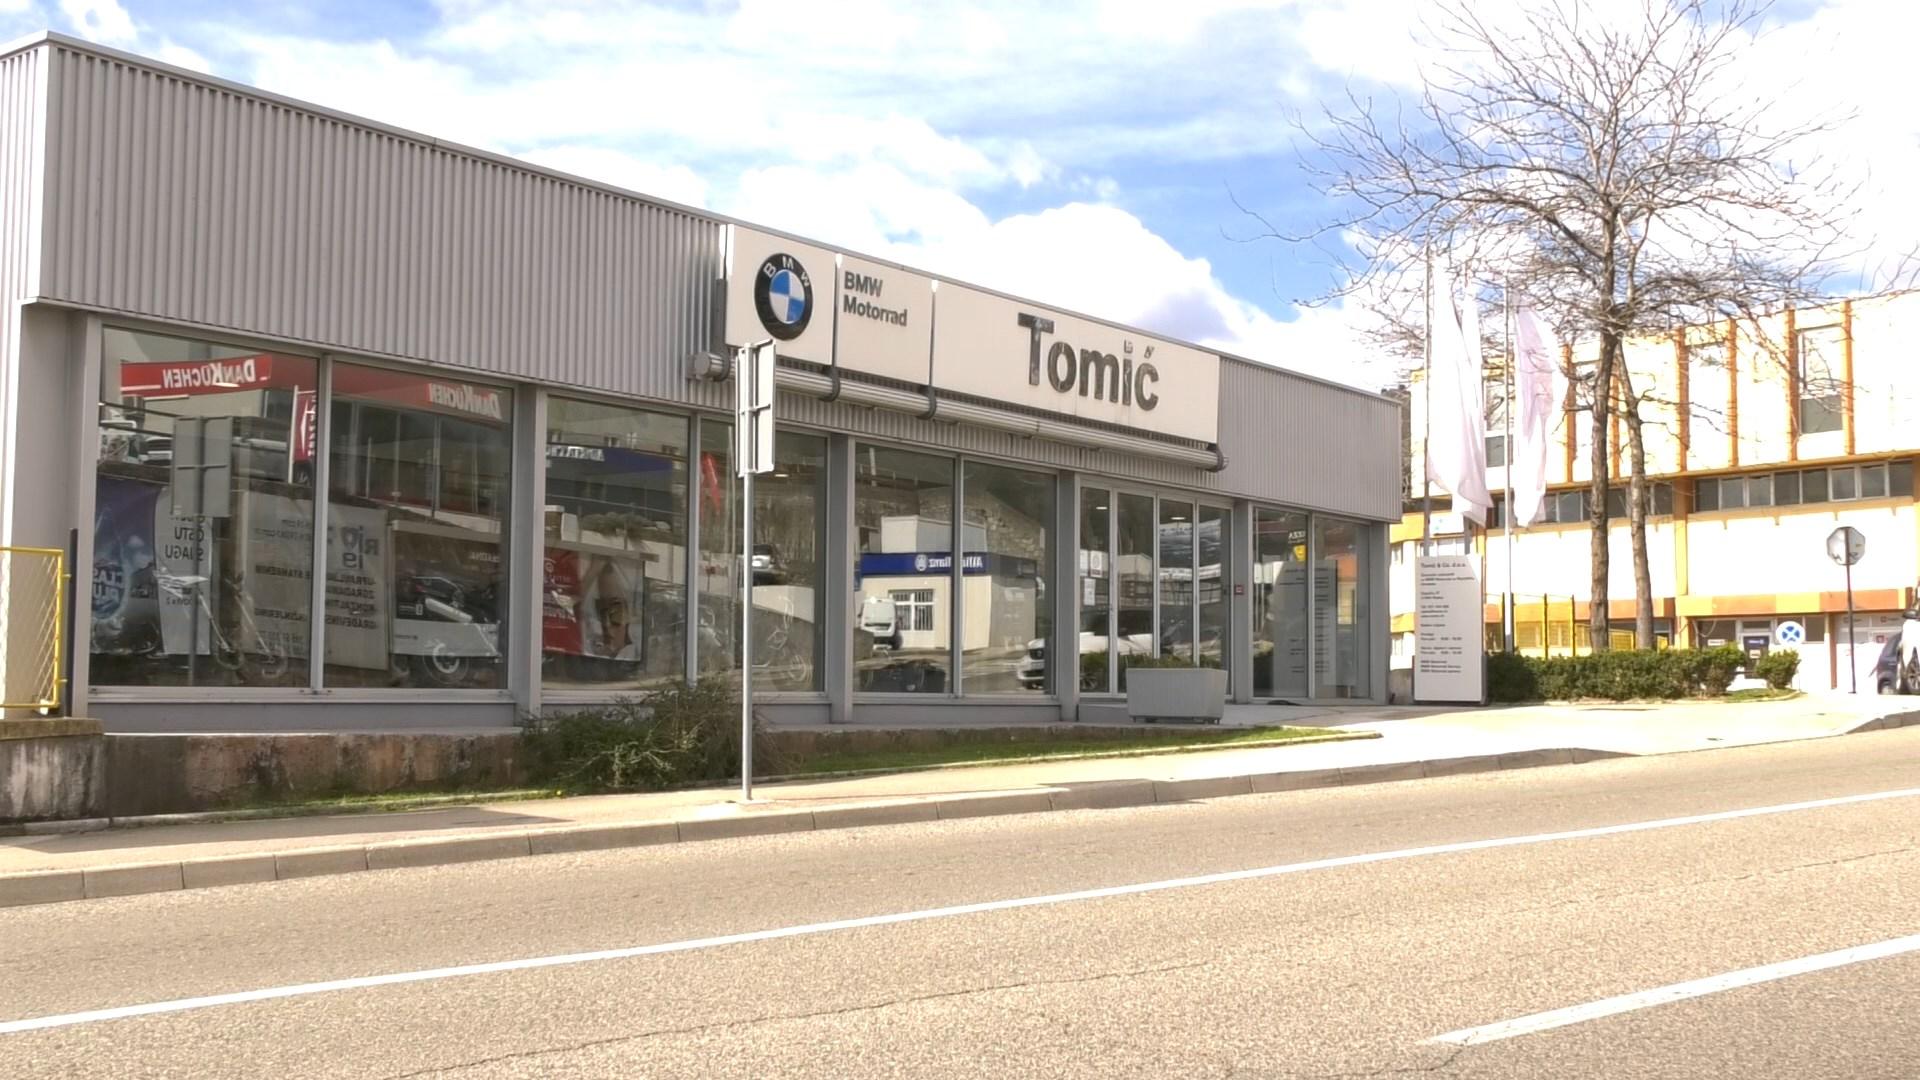 Extravagant auto: BMW Tomić&Co